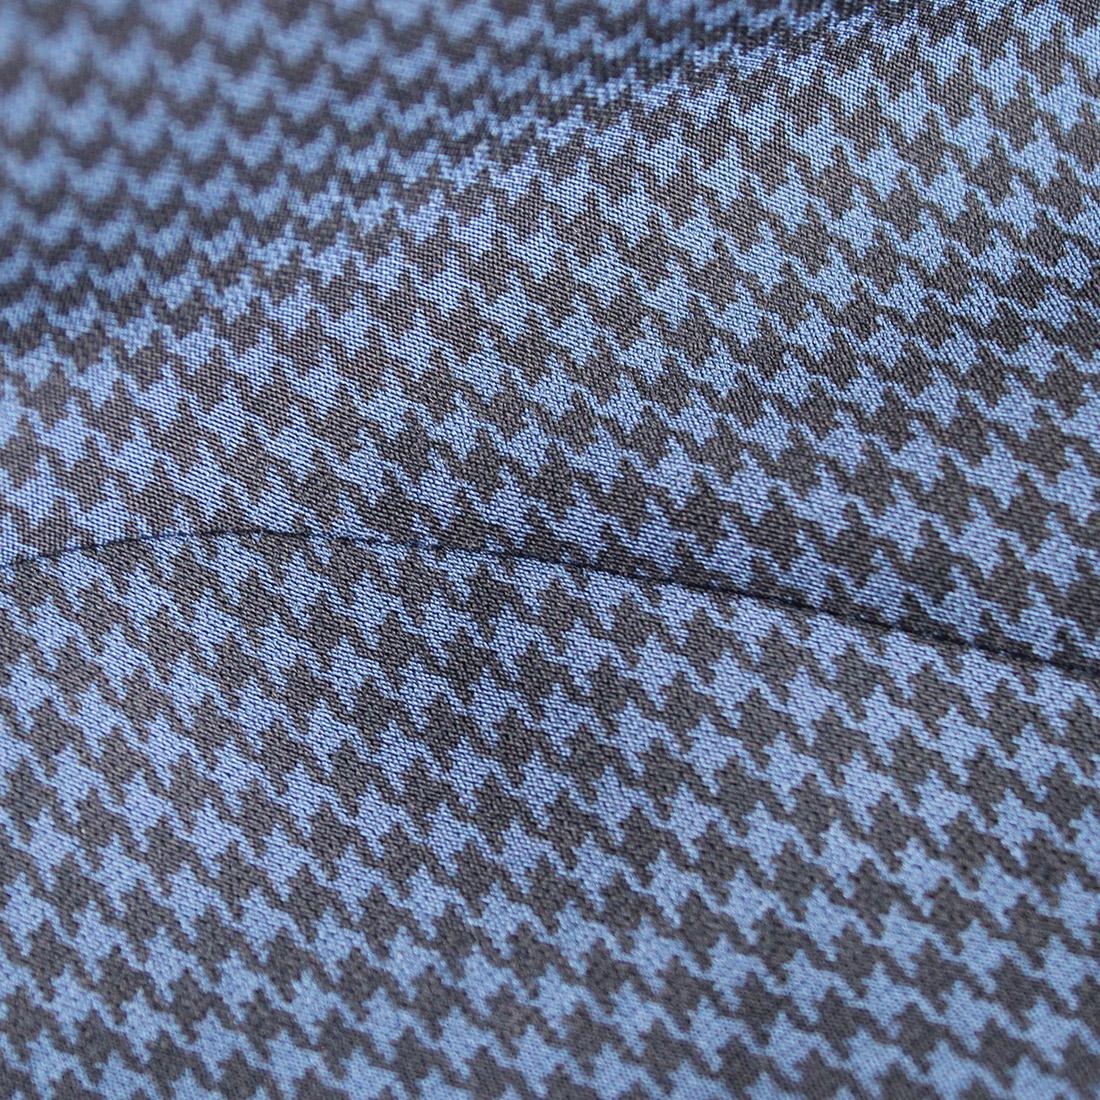 Damen 7/8 Slim Fit Stretchhose aus Funktionsmaterial mit stylischem Print